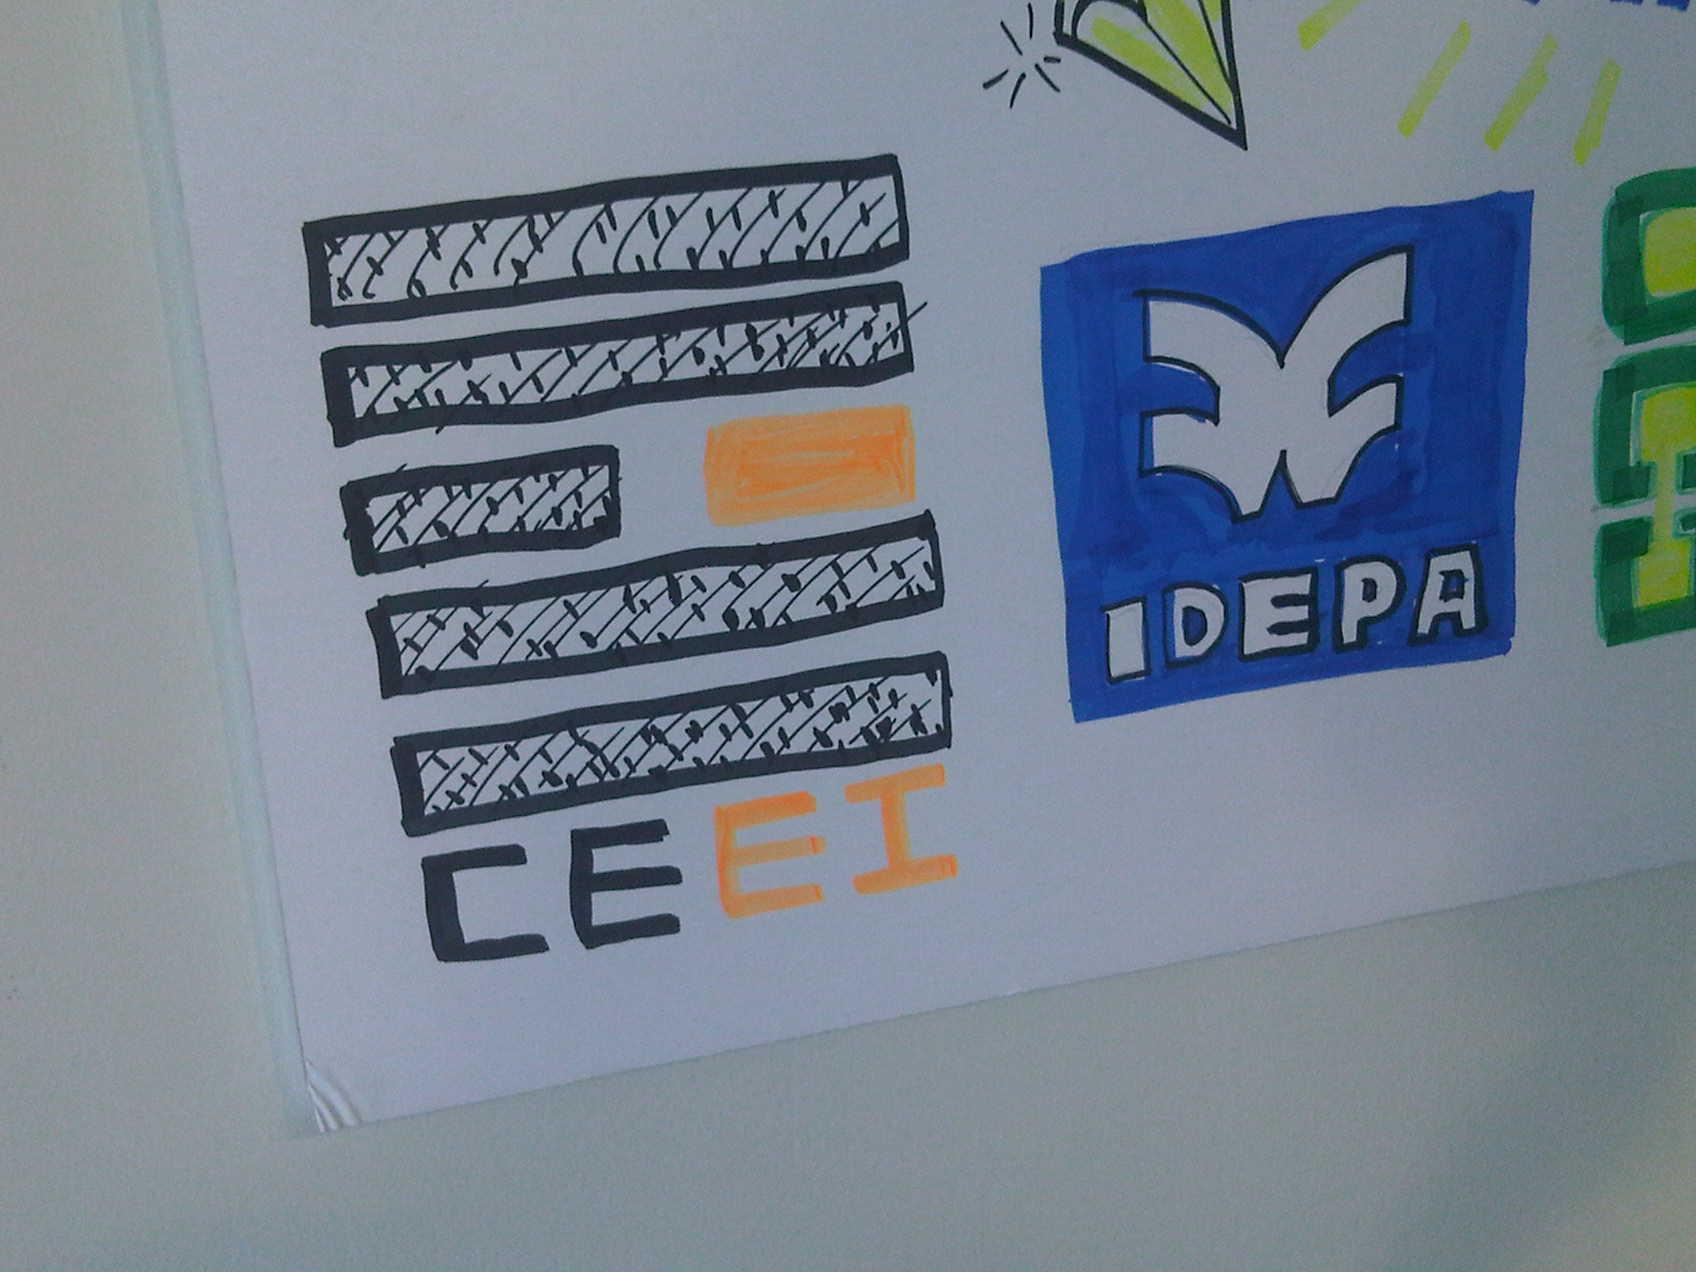 Ceeiamano1